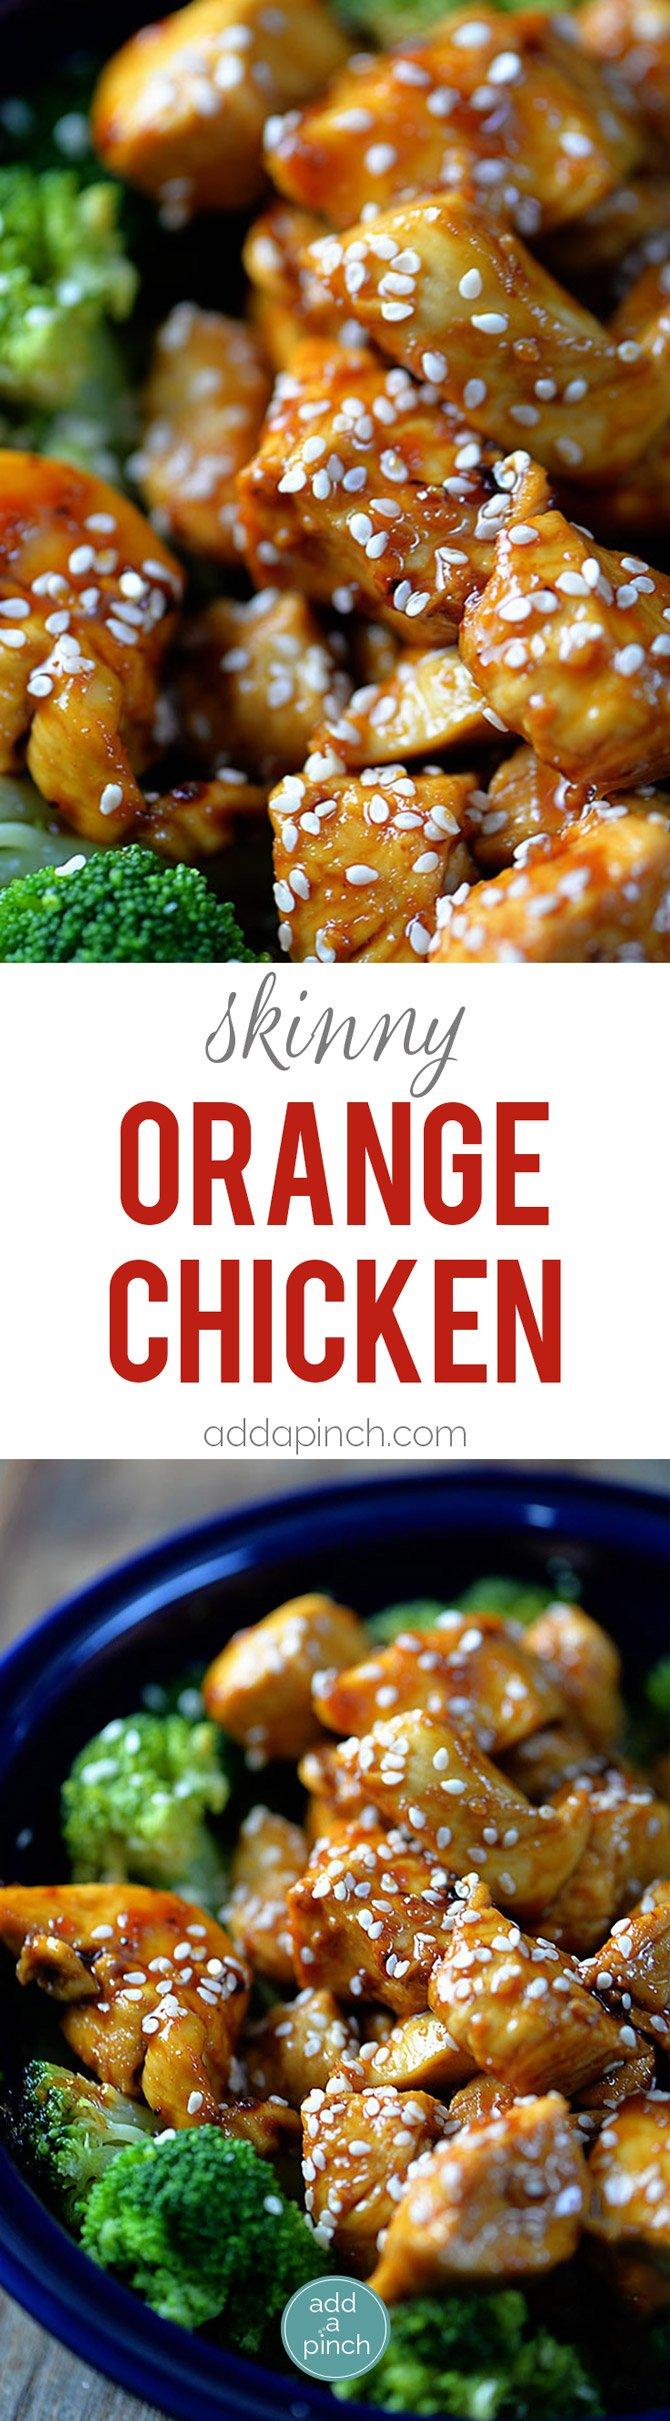 Orange Chicken makes a favorite Chinese dish. A lightened Orange Chicken recipe which is Paleo-friendly, gluten-free, and grain-free, yet full of flavor! // addapinch.com